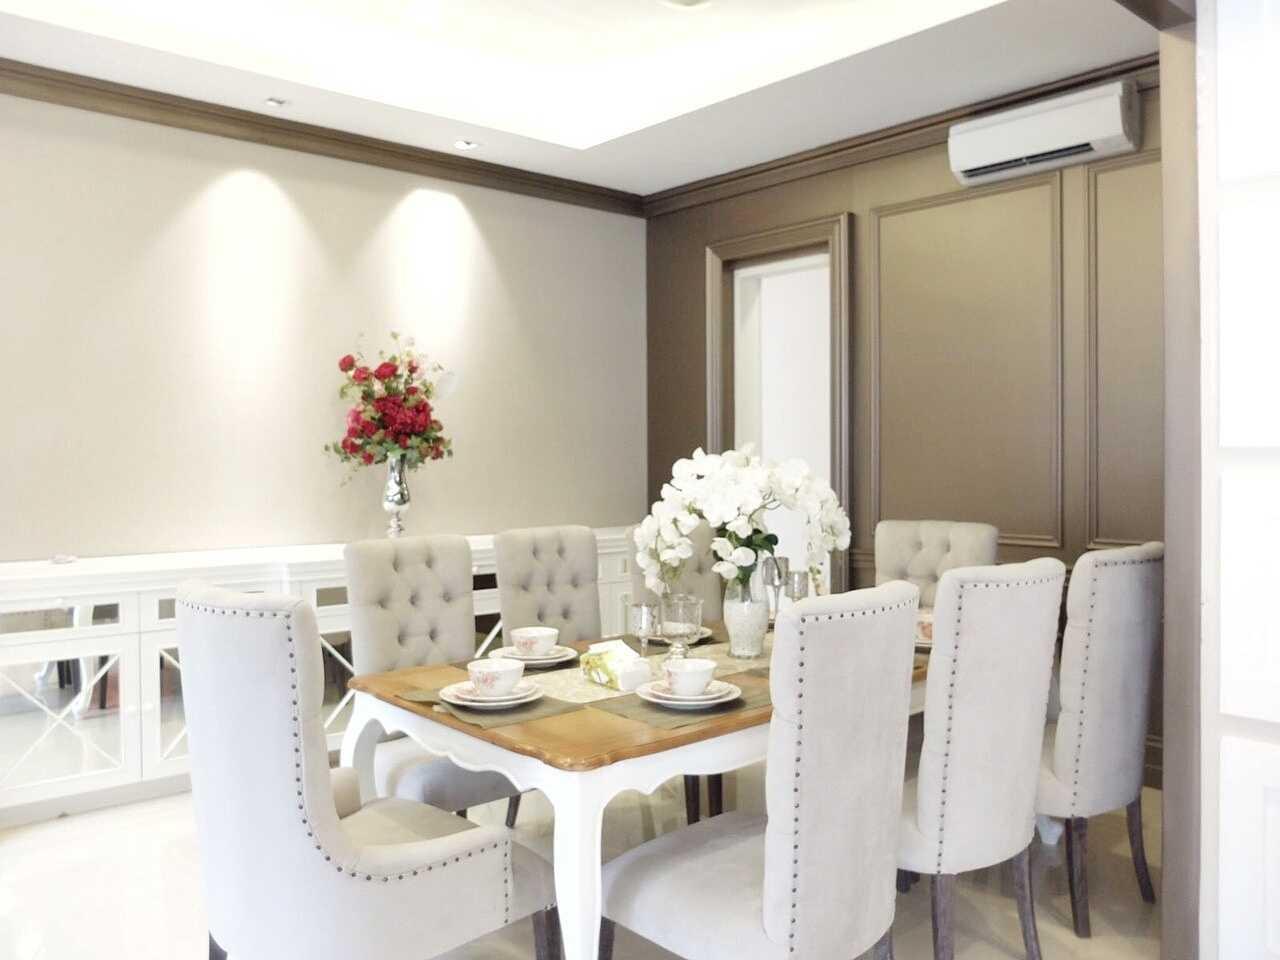 7Design Architect Mrs. D House Citrasun, Yogjakarta Citrasun, Yogjakarta Diningroom Klasik 18699